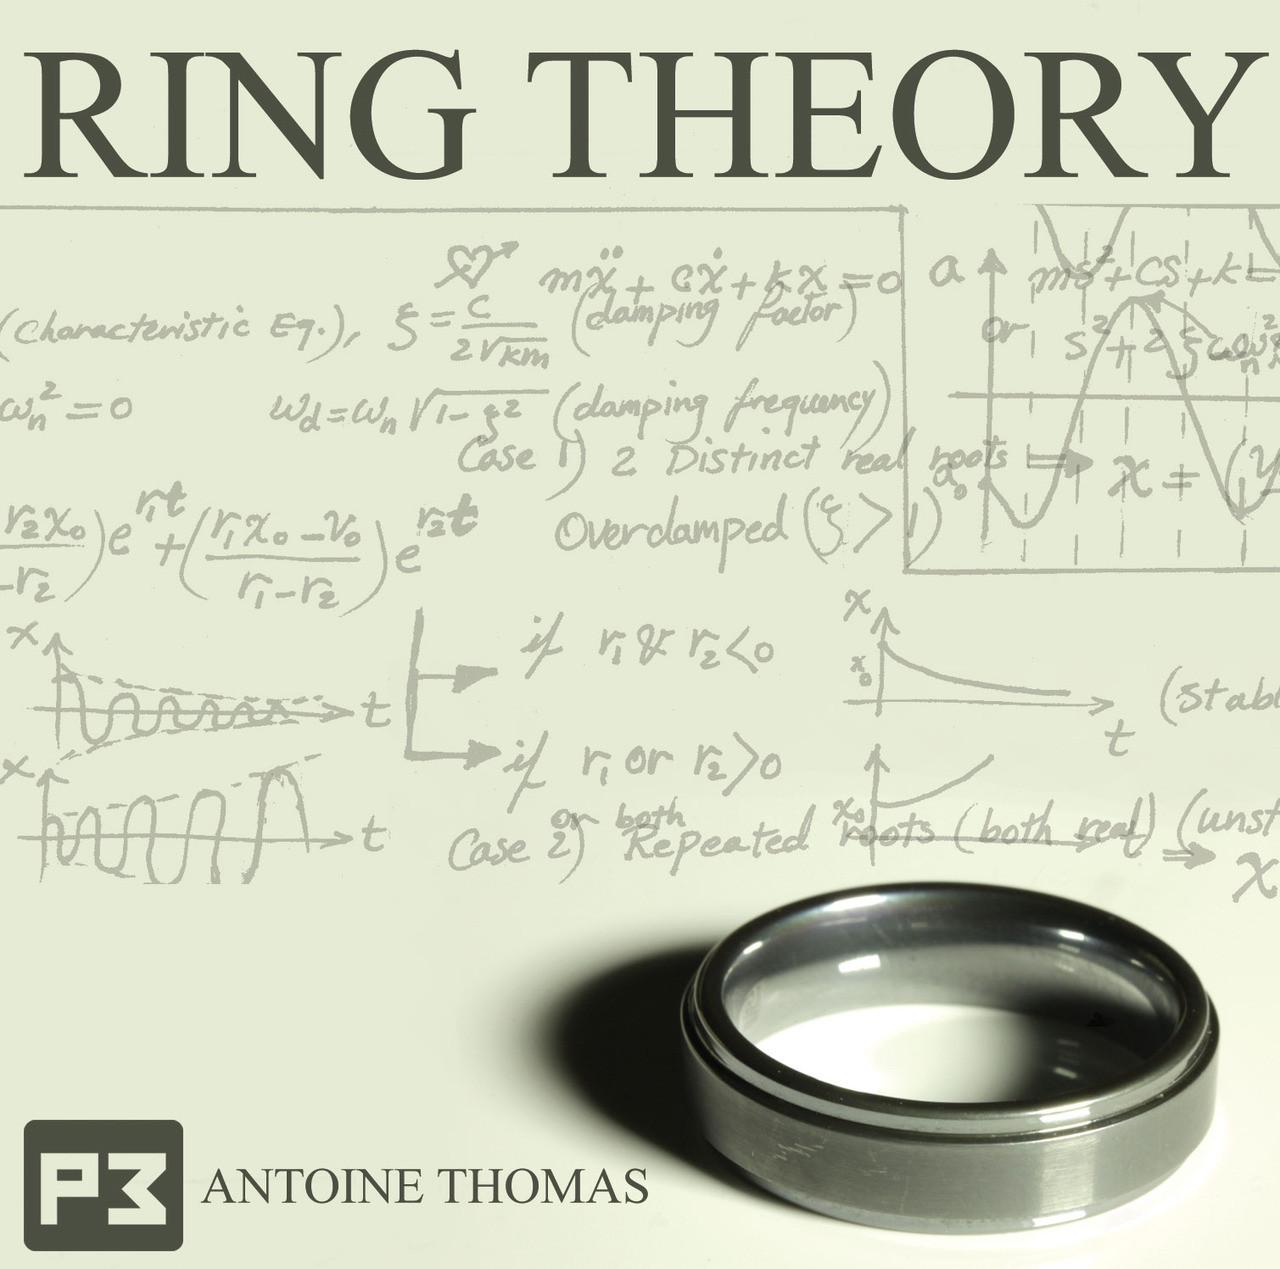 Ring Theory by Antonine Thomas